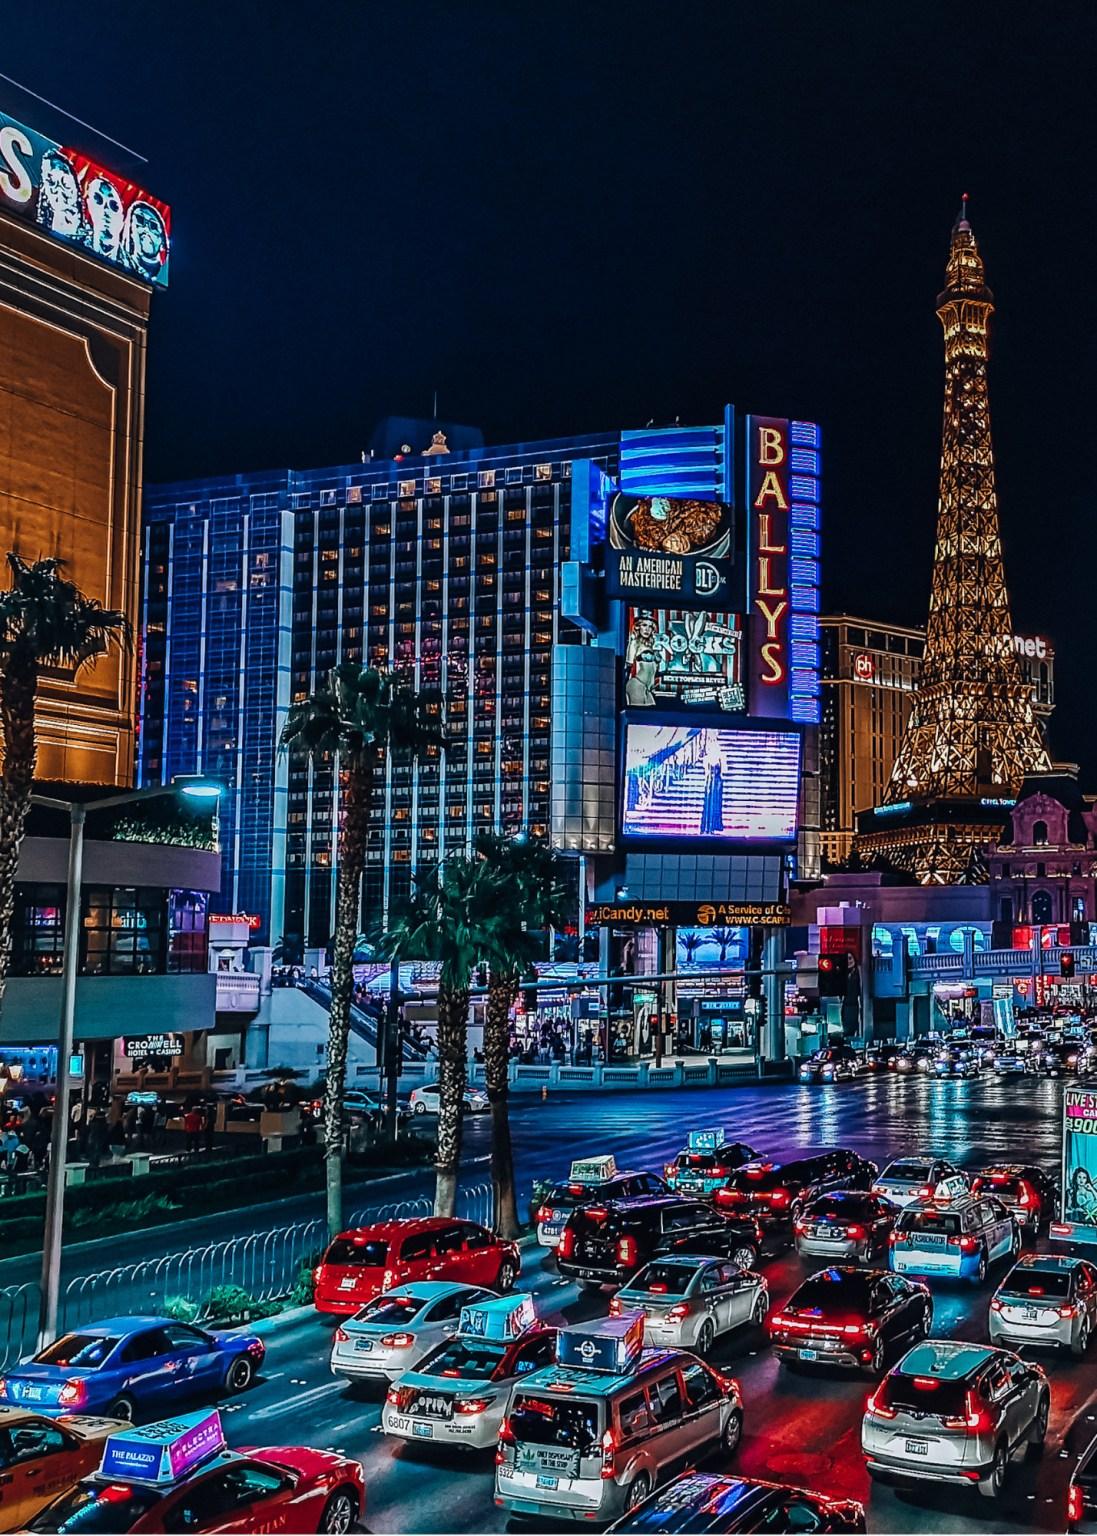 Newcastle Properties Invests in Las Vegas